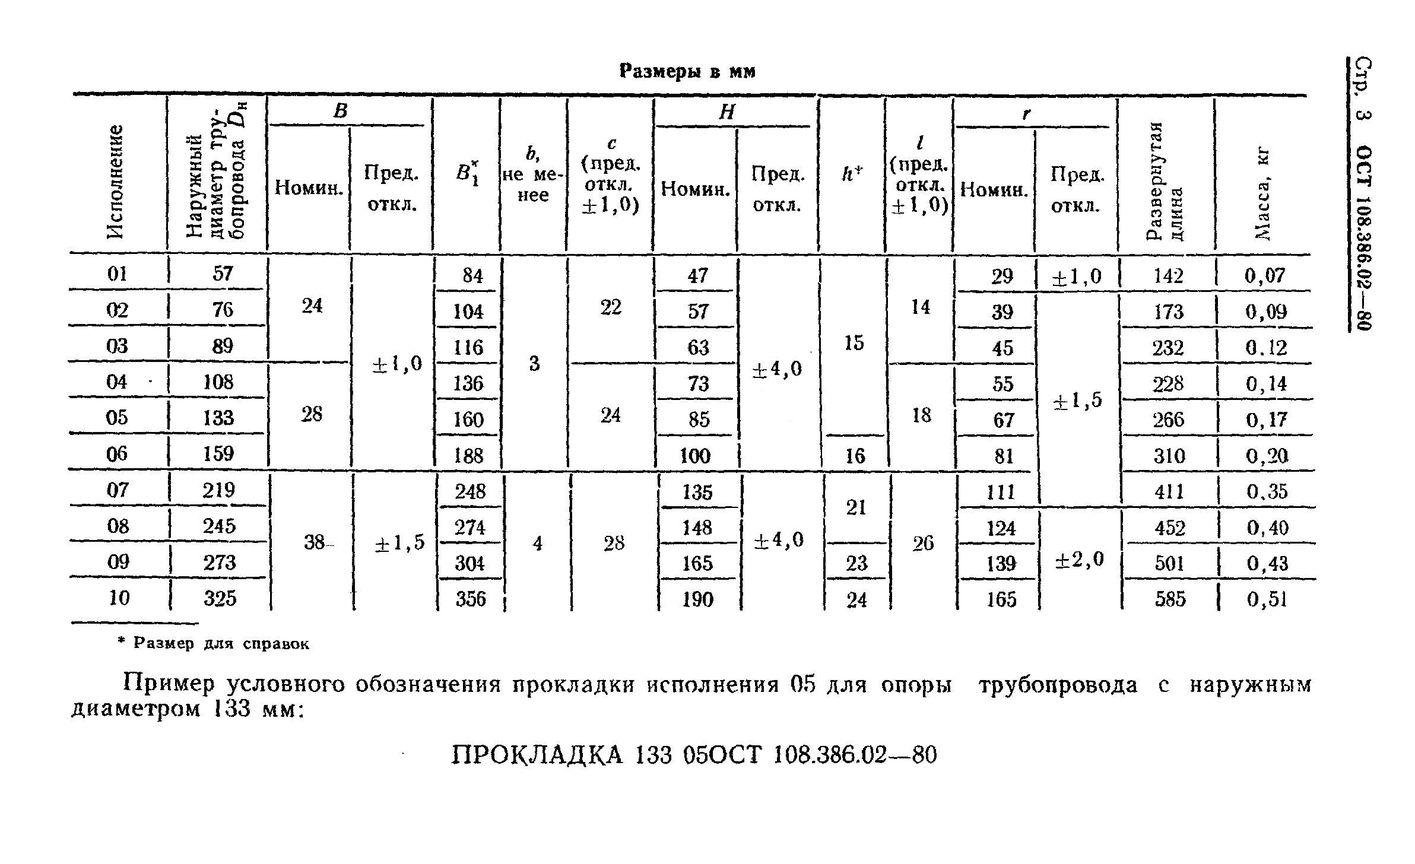 Прокладки ОСТ 108.386.02-80 стр.3